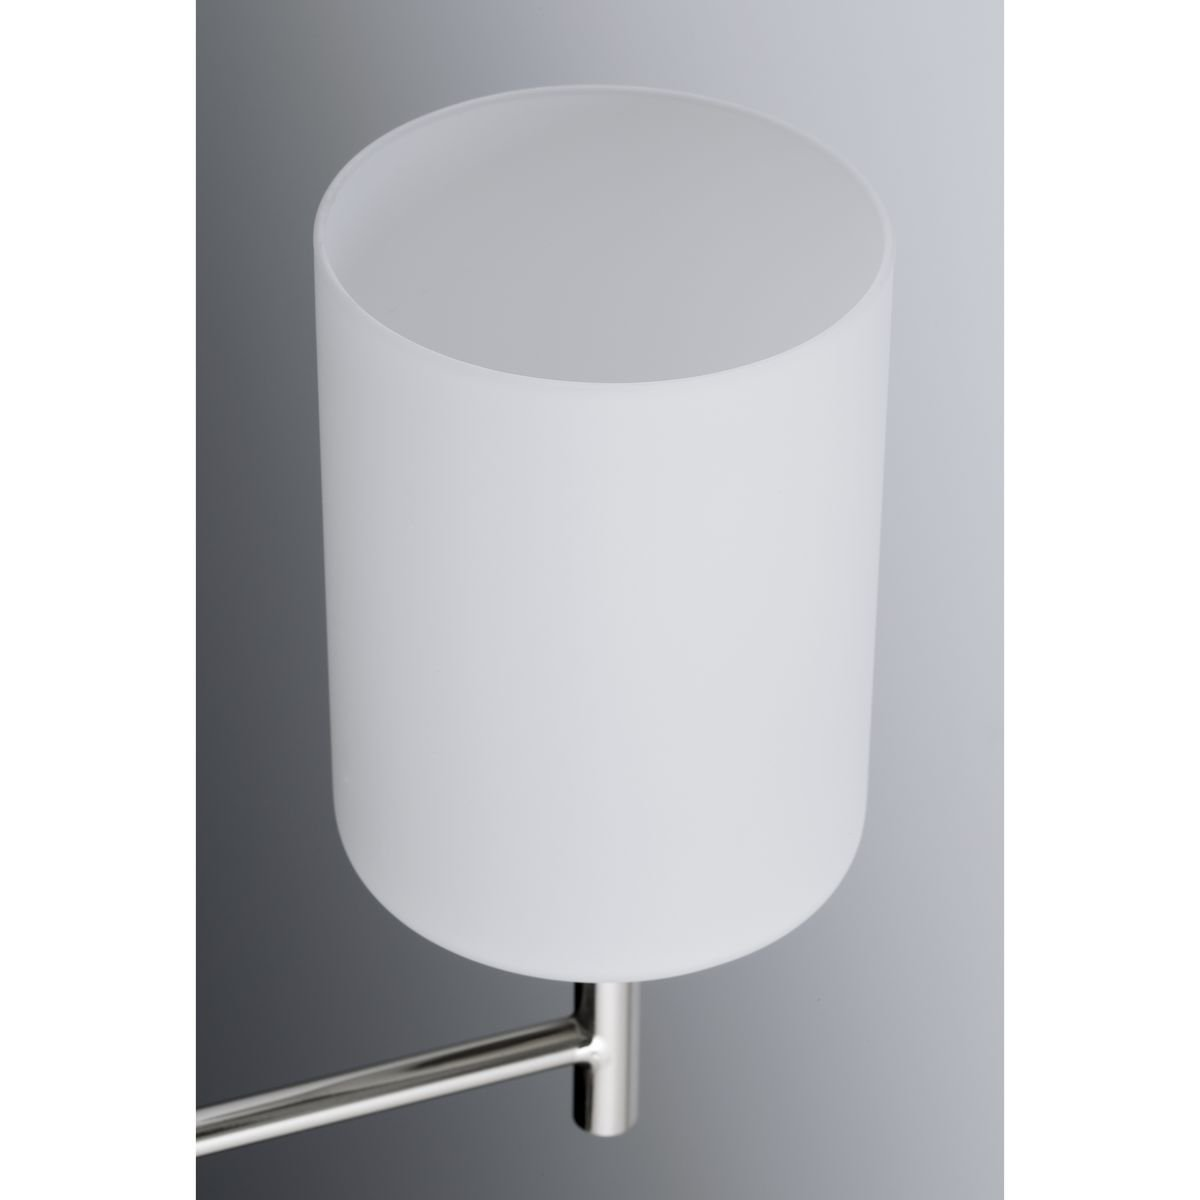 Progress Lighting P2159-09 Contemporary/Soft 3-100W Med Bath Bracket, Brushed Nickel by Progress Lighting (Image #5)